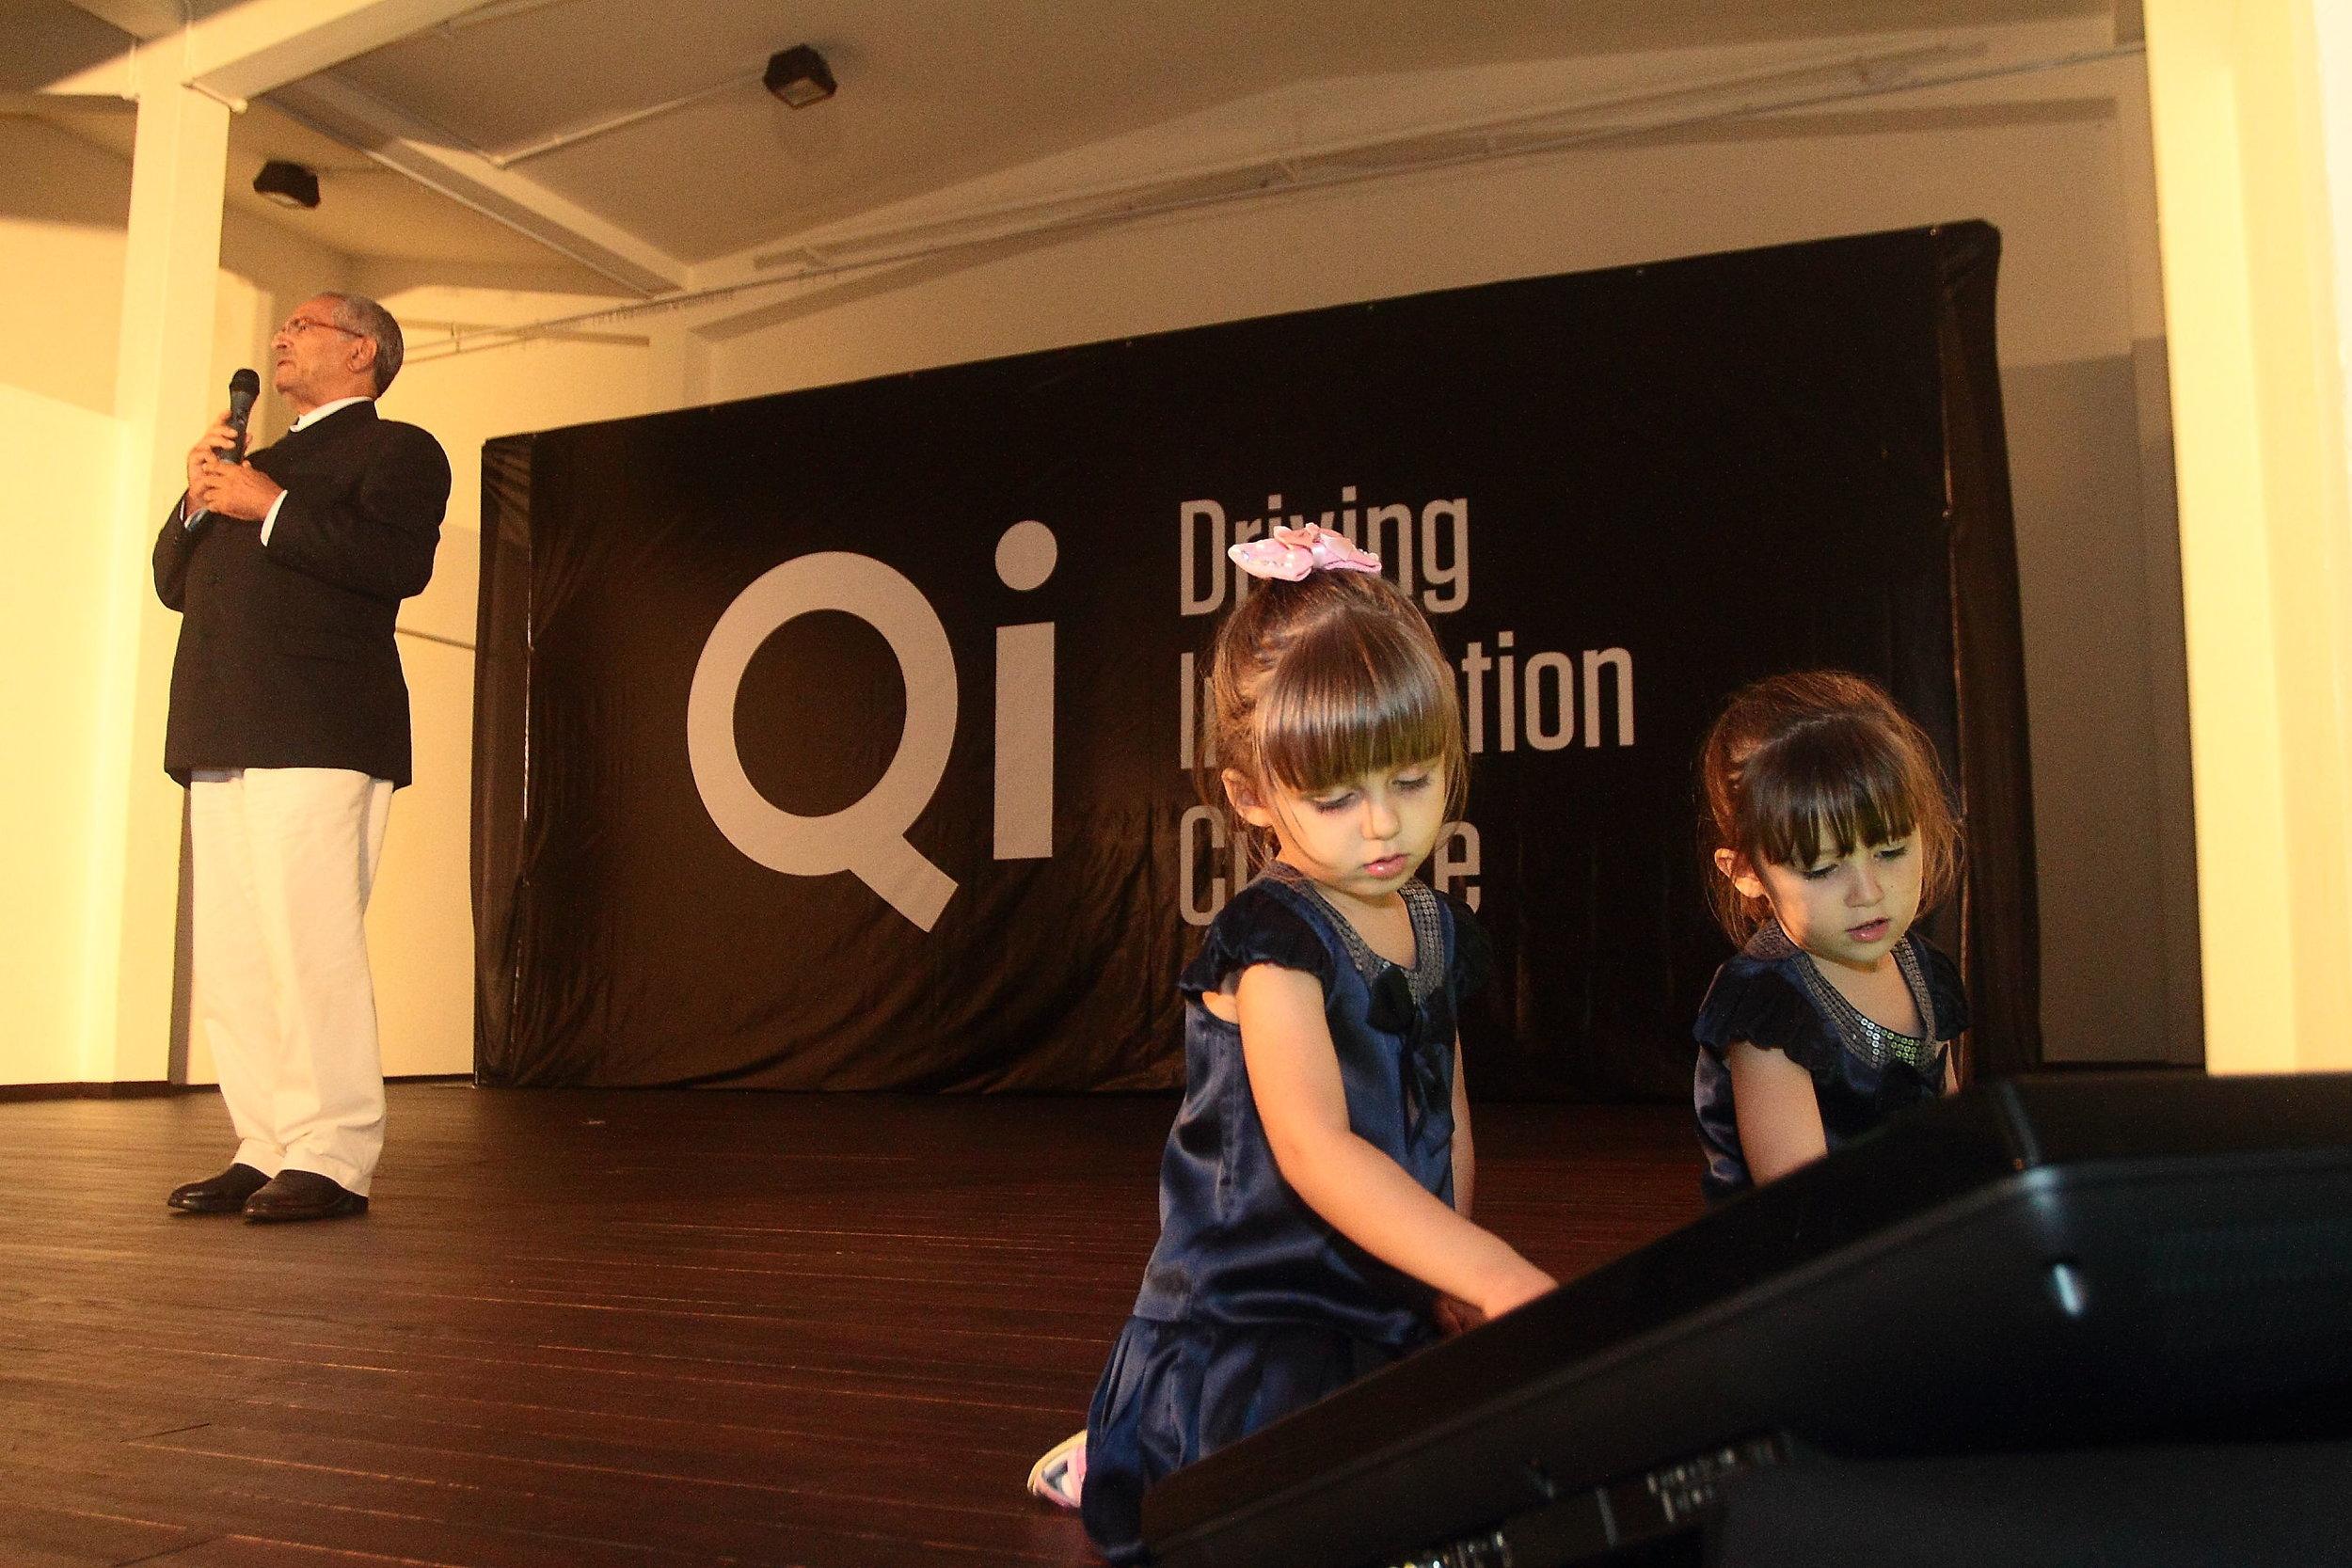 qi-global-2011-driving-innovation-culture-029.jpg